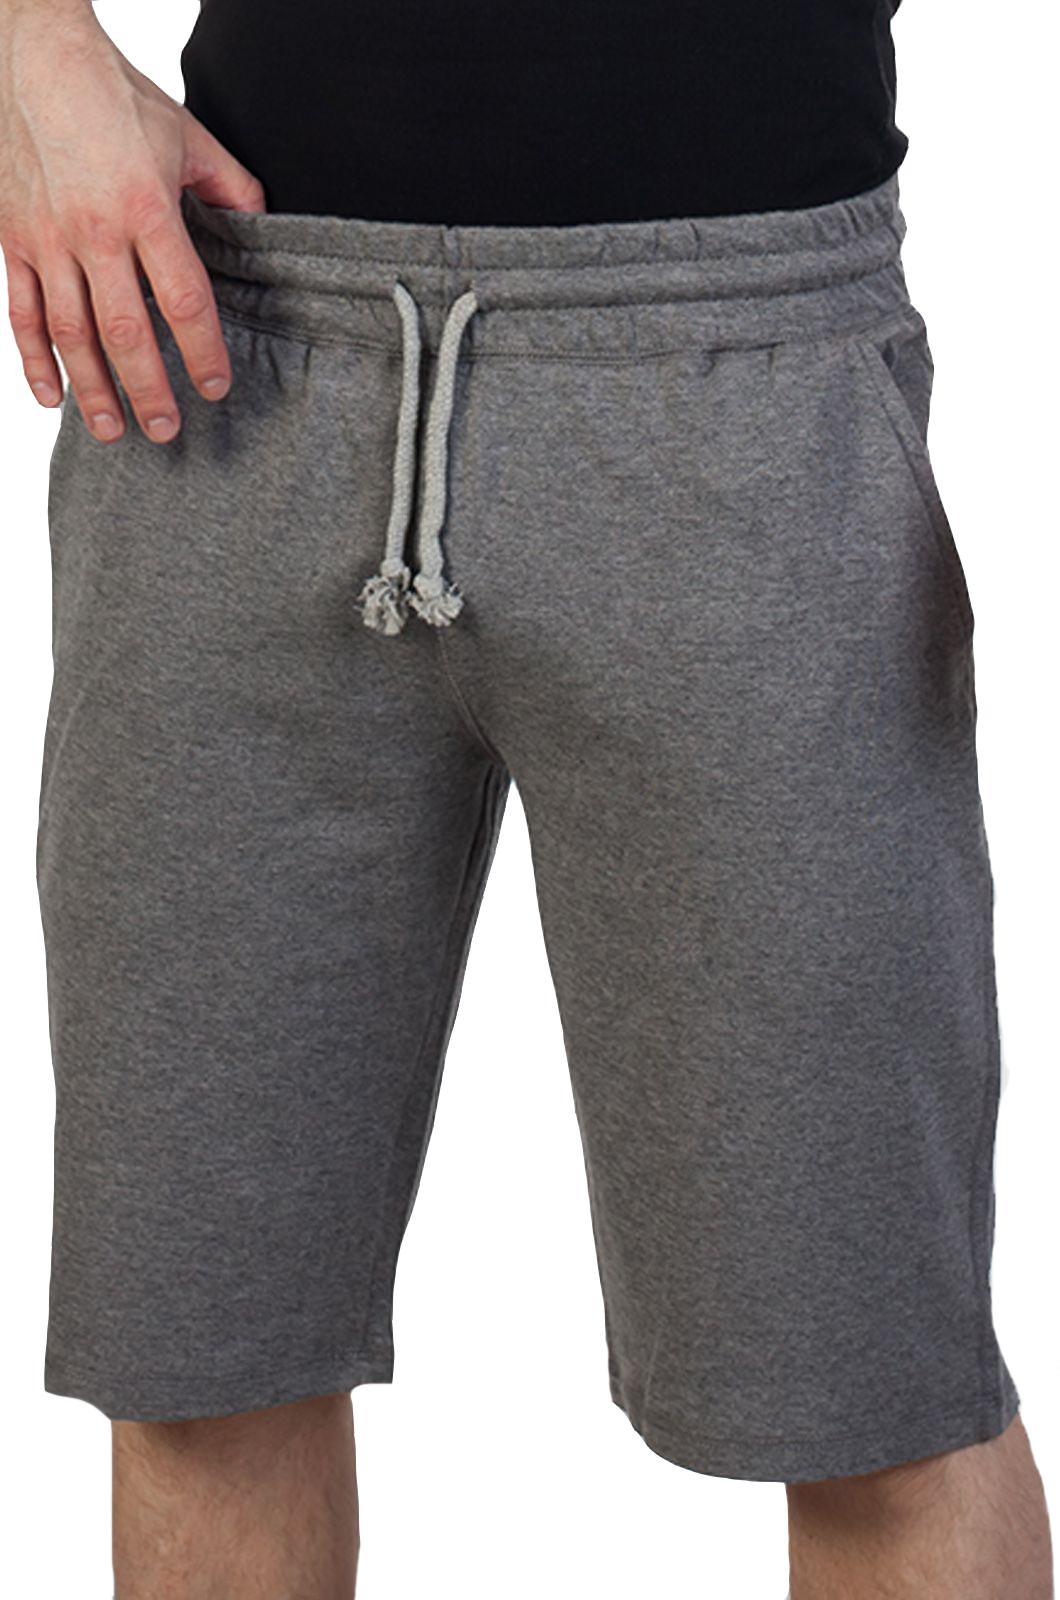 Серые мужские шорты от French Onion